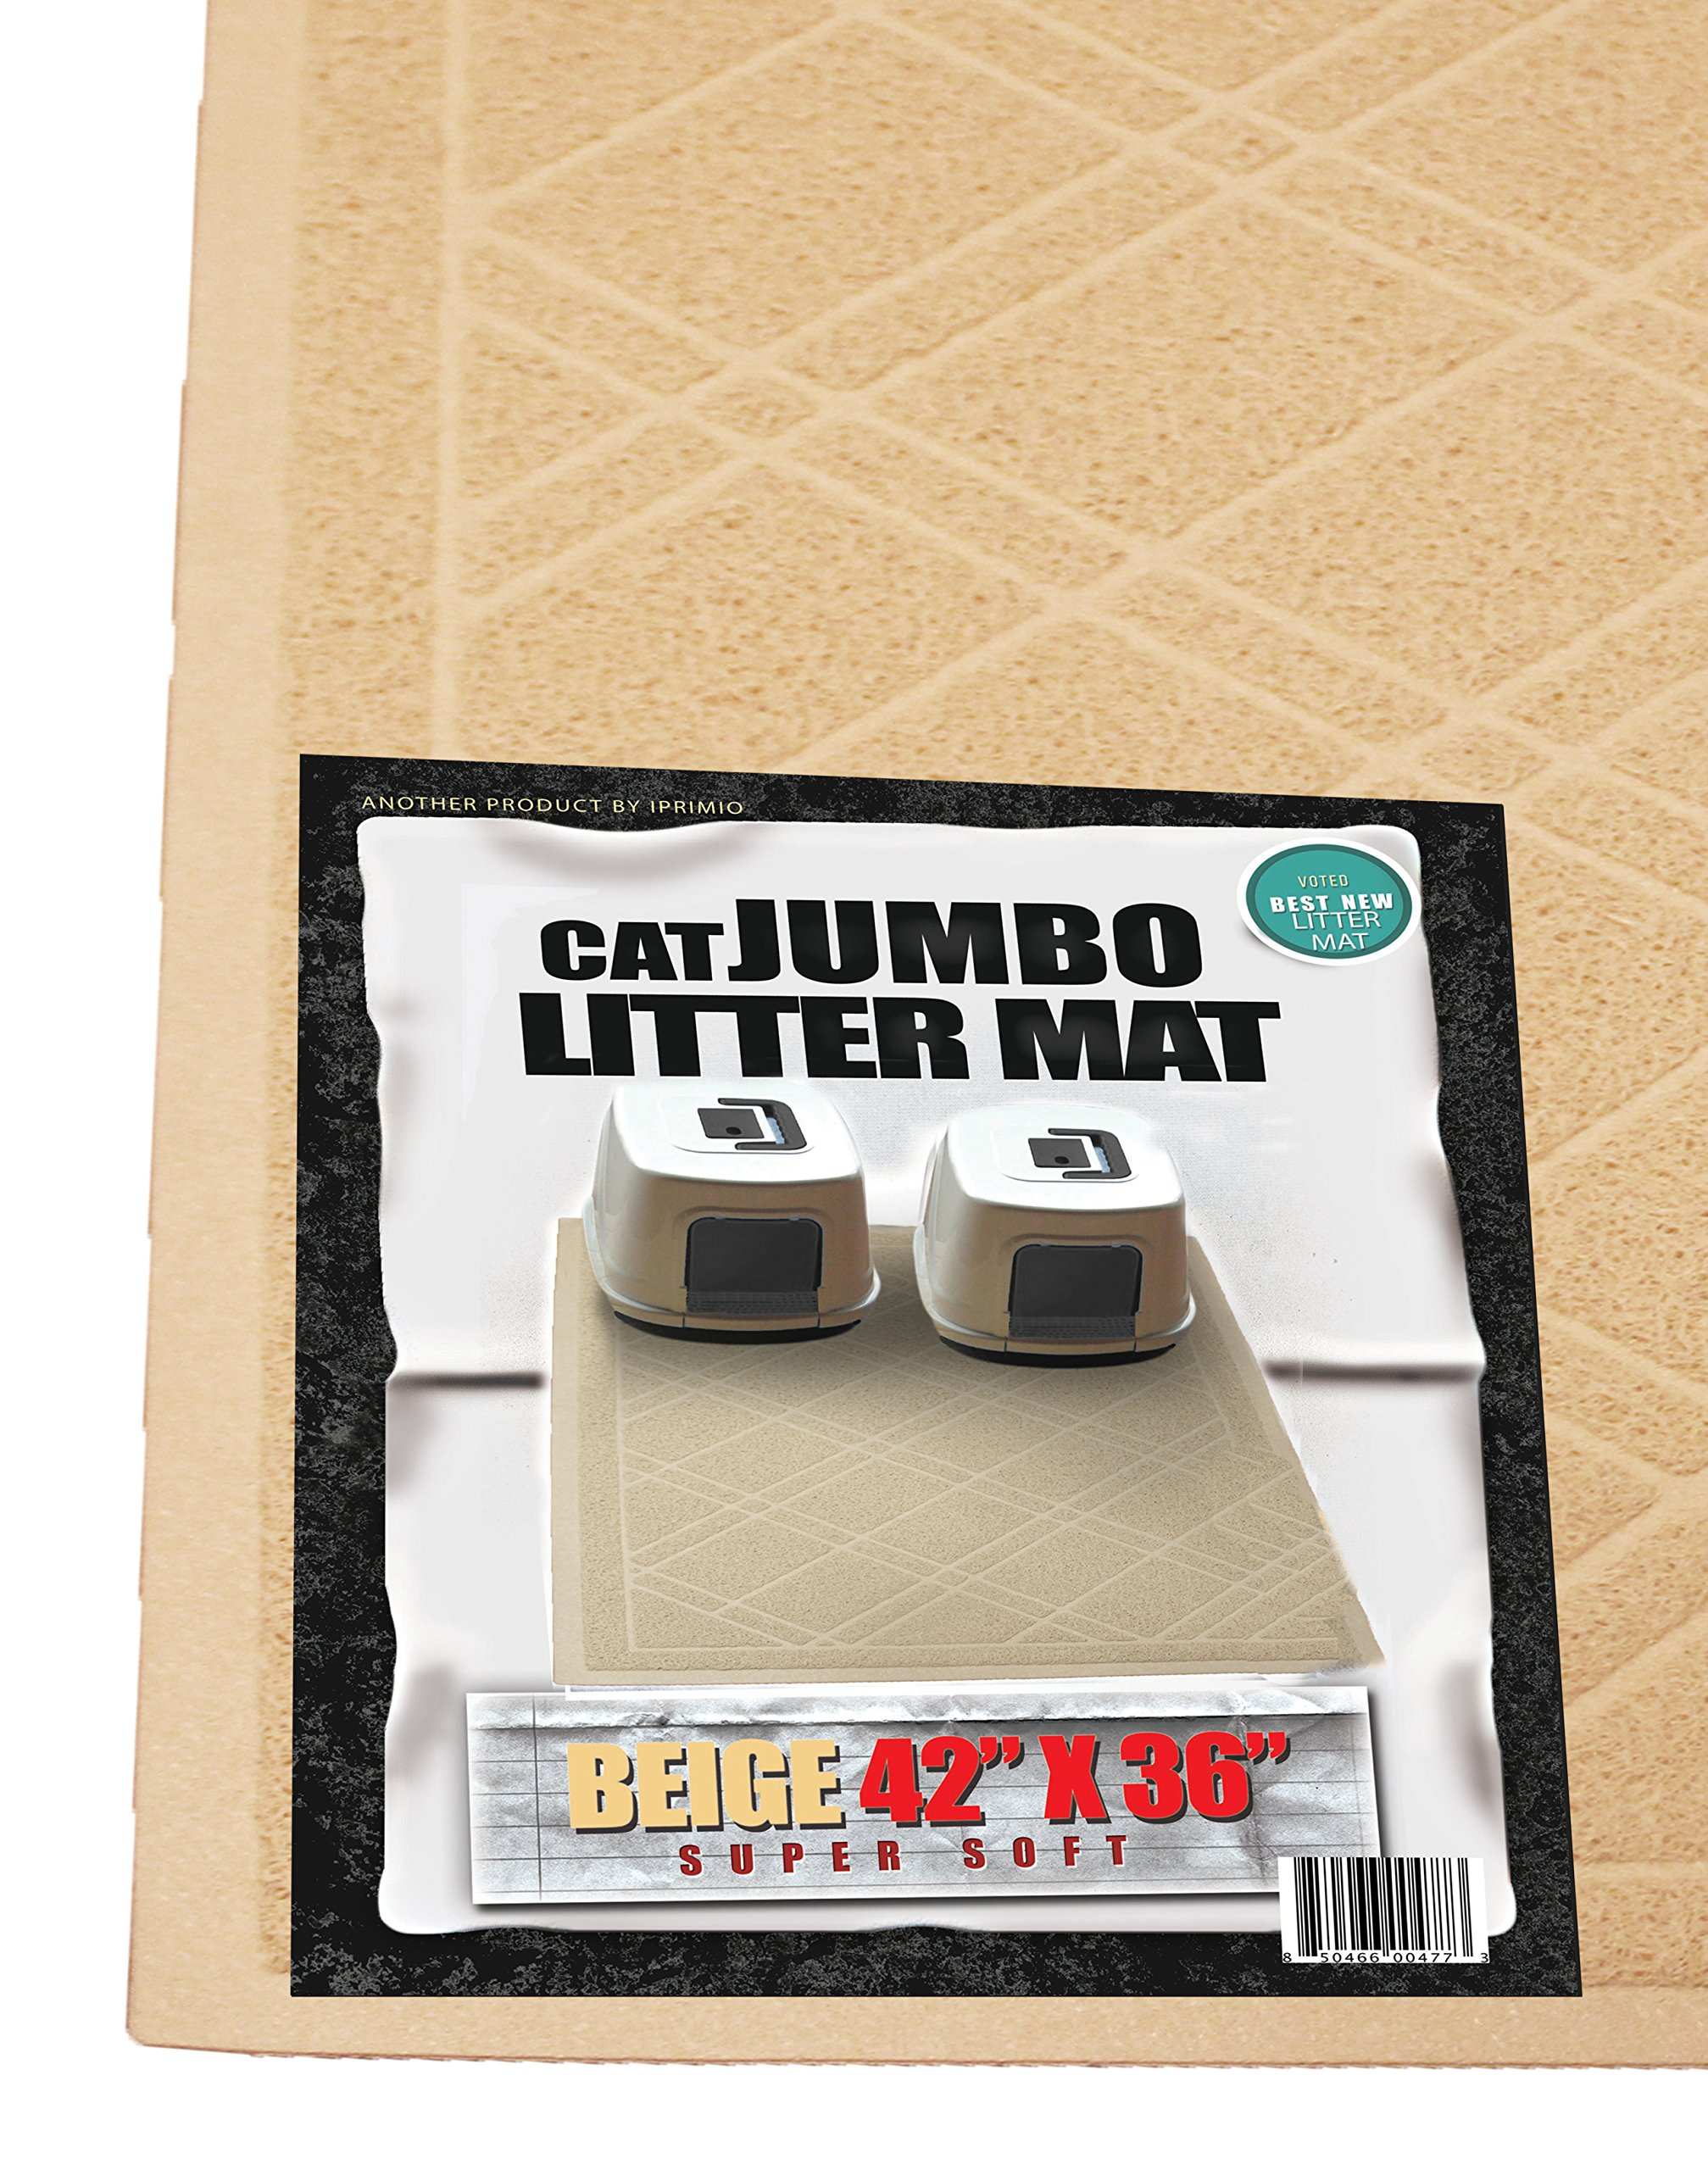 free jumbo litter bpp phthalate x design cat mat blue gray mats plaid product iprimio with